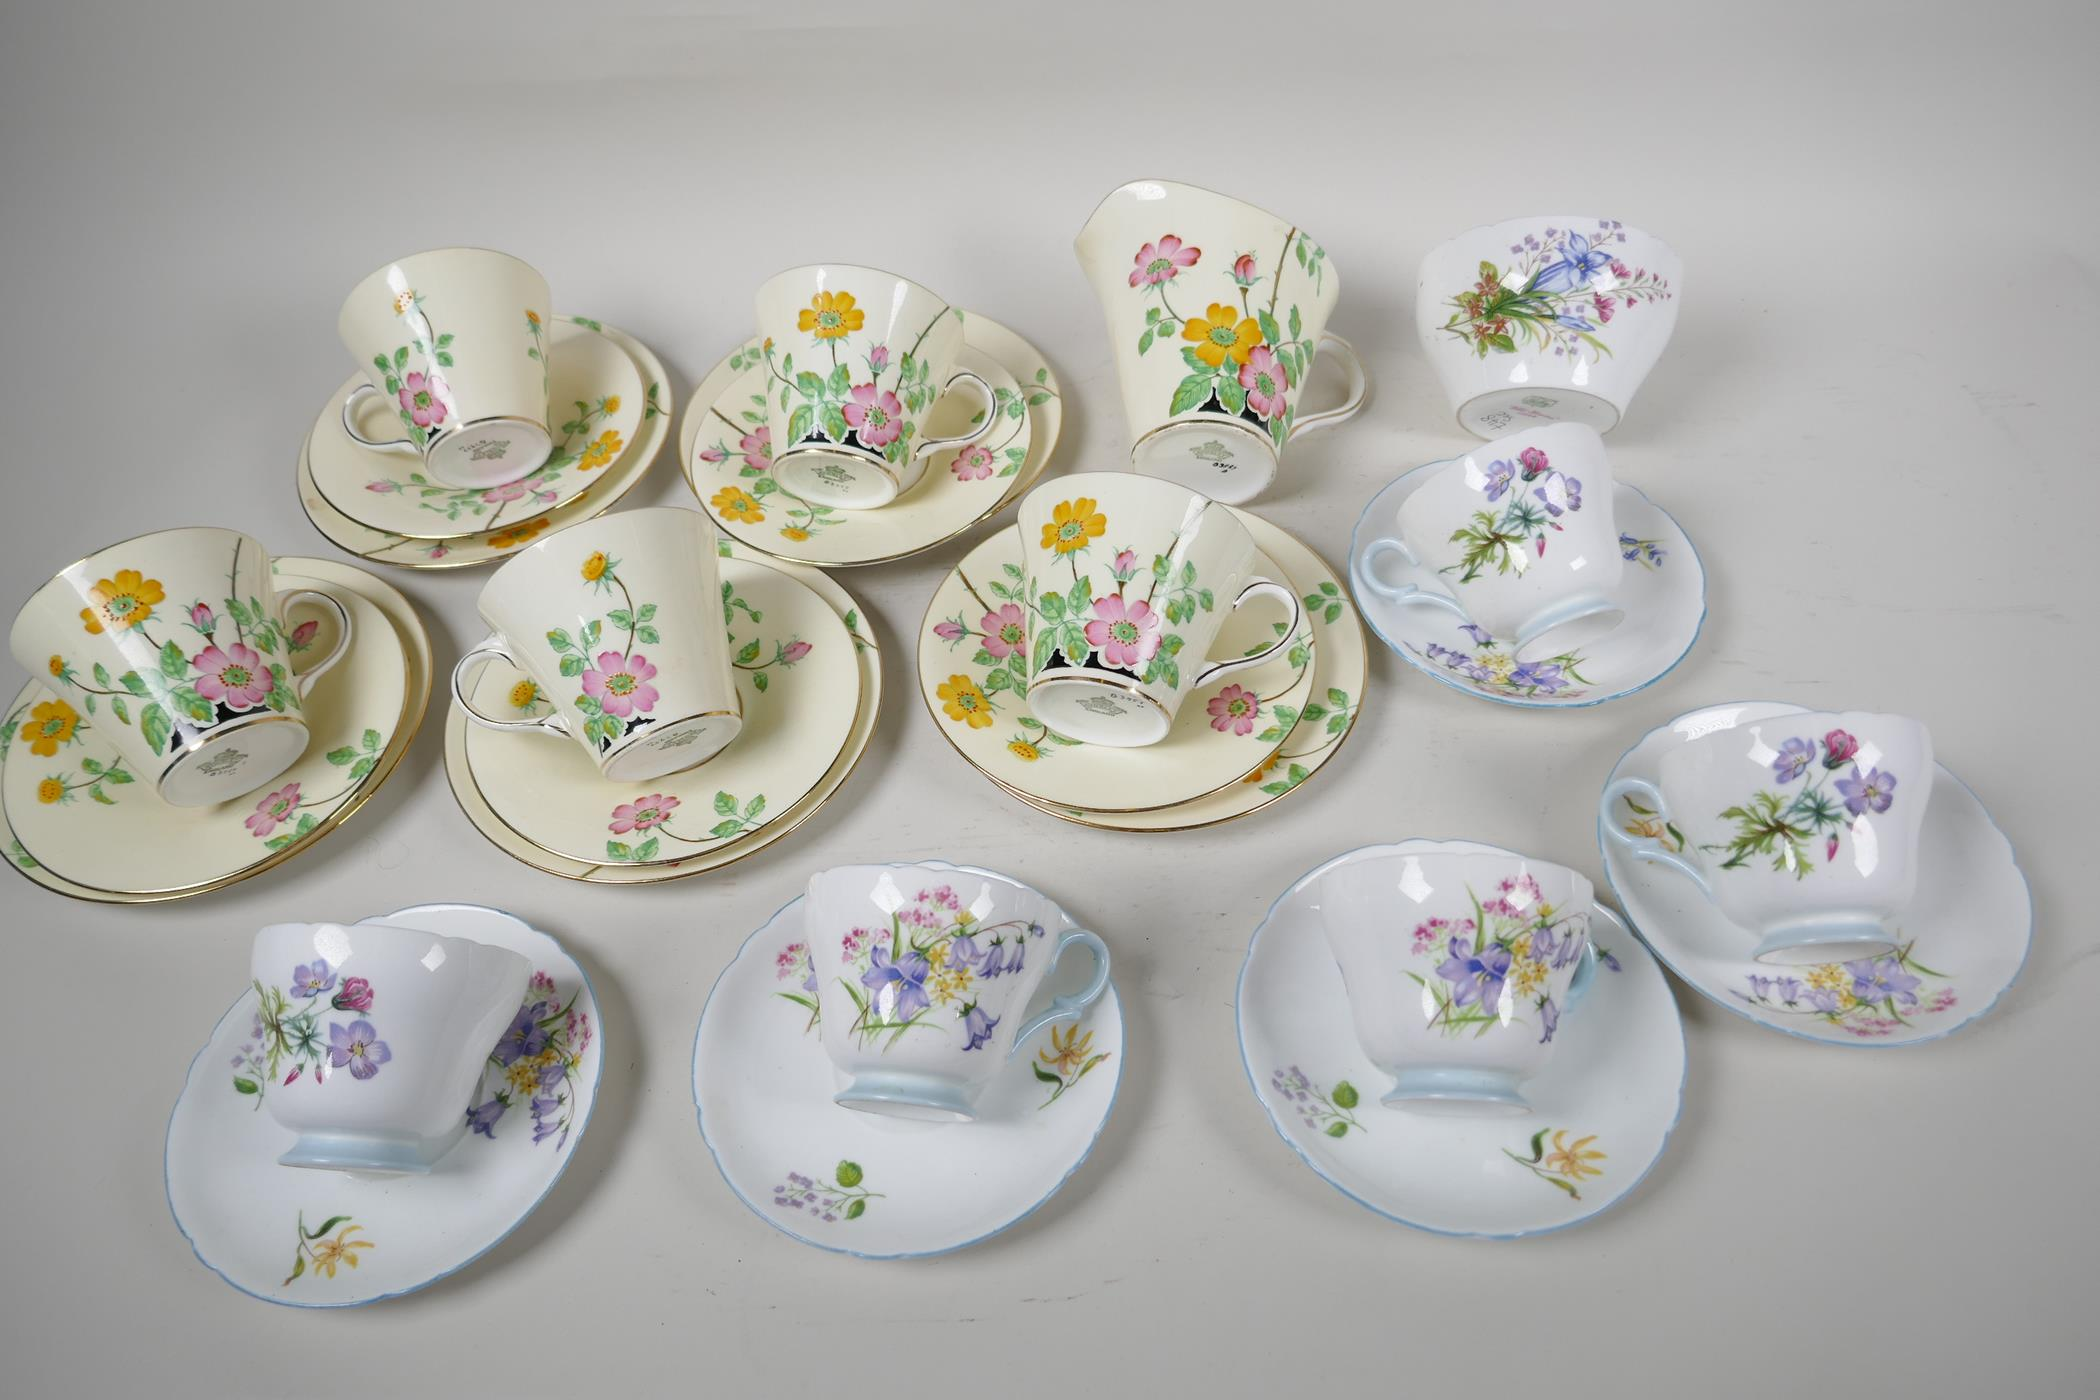 A five place setting Aynsley china tea set with milk jug, together with a five place setting Shelley